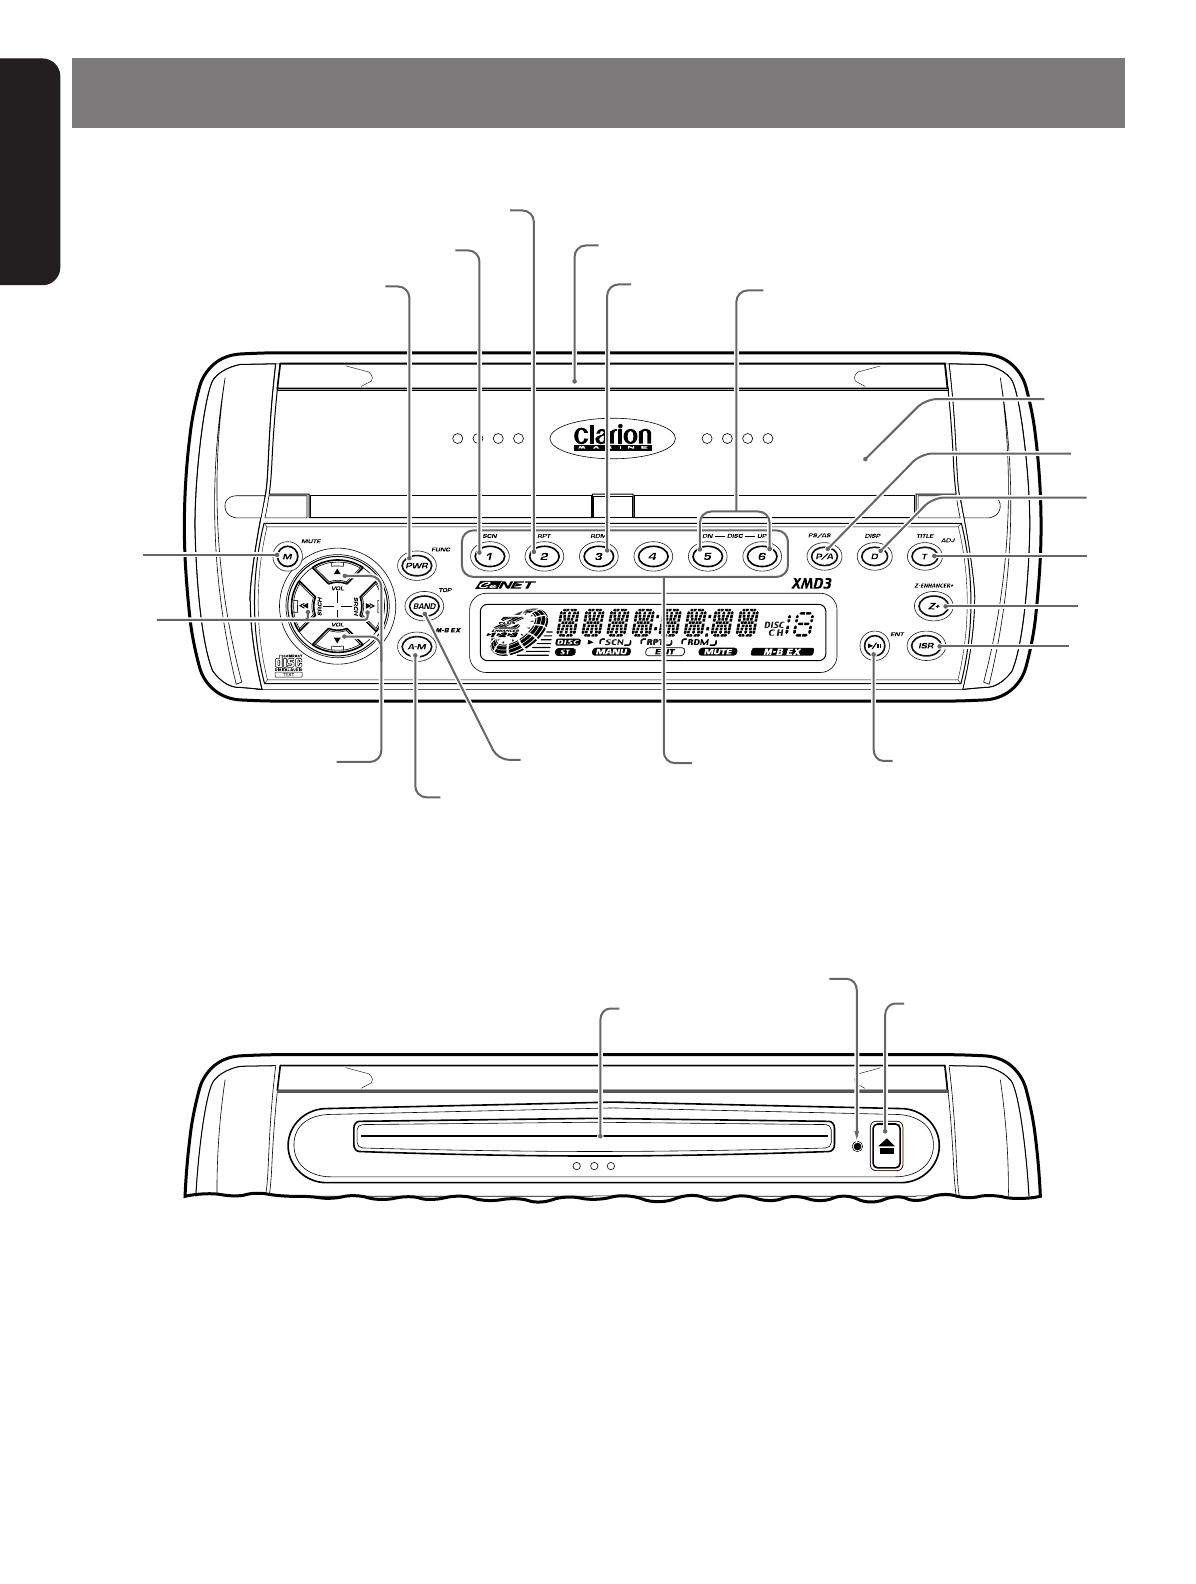 Handleiding Clarion Xmd3 Pagina 5 Van 22 English Marine Wiring Diagram